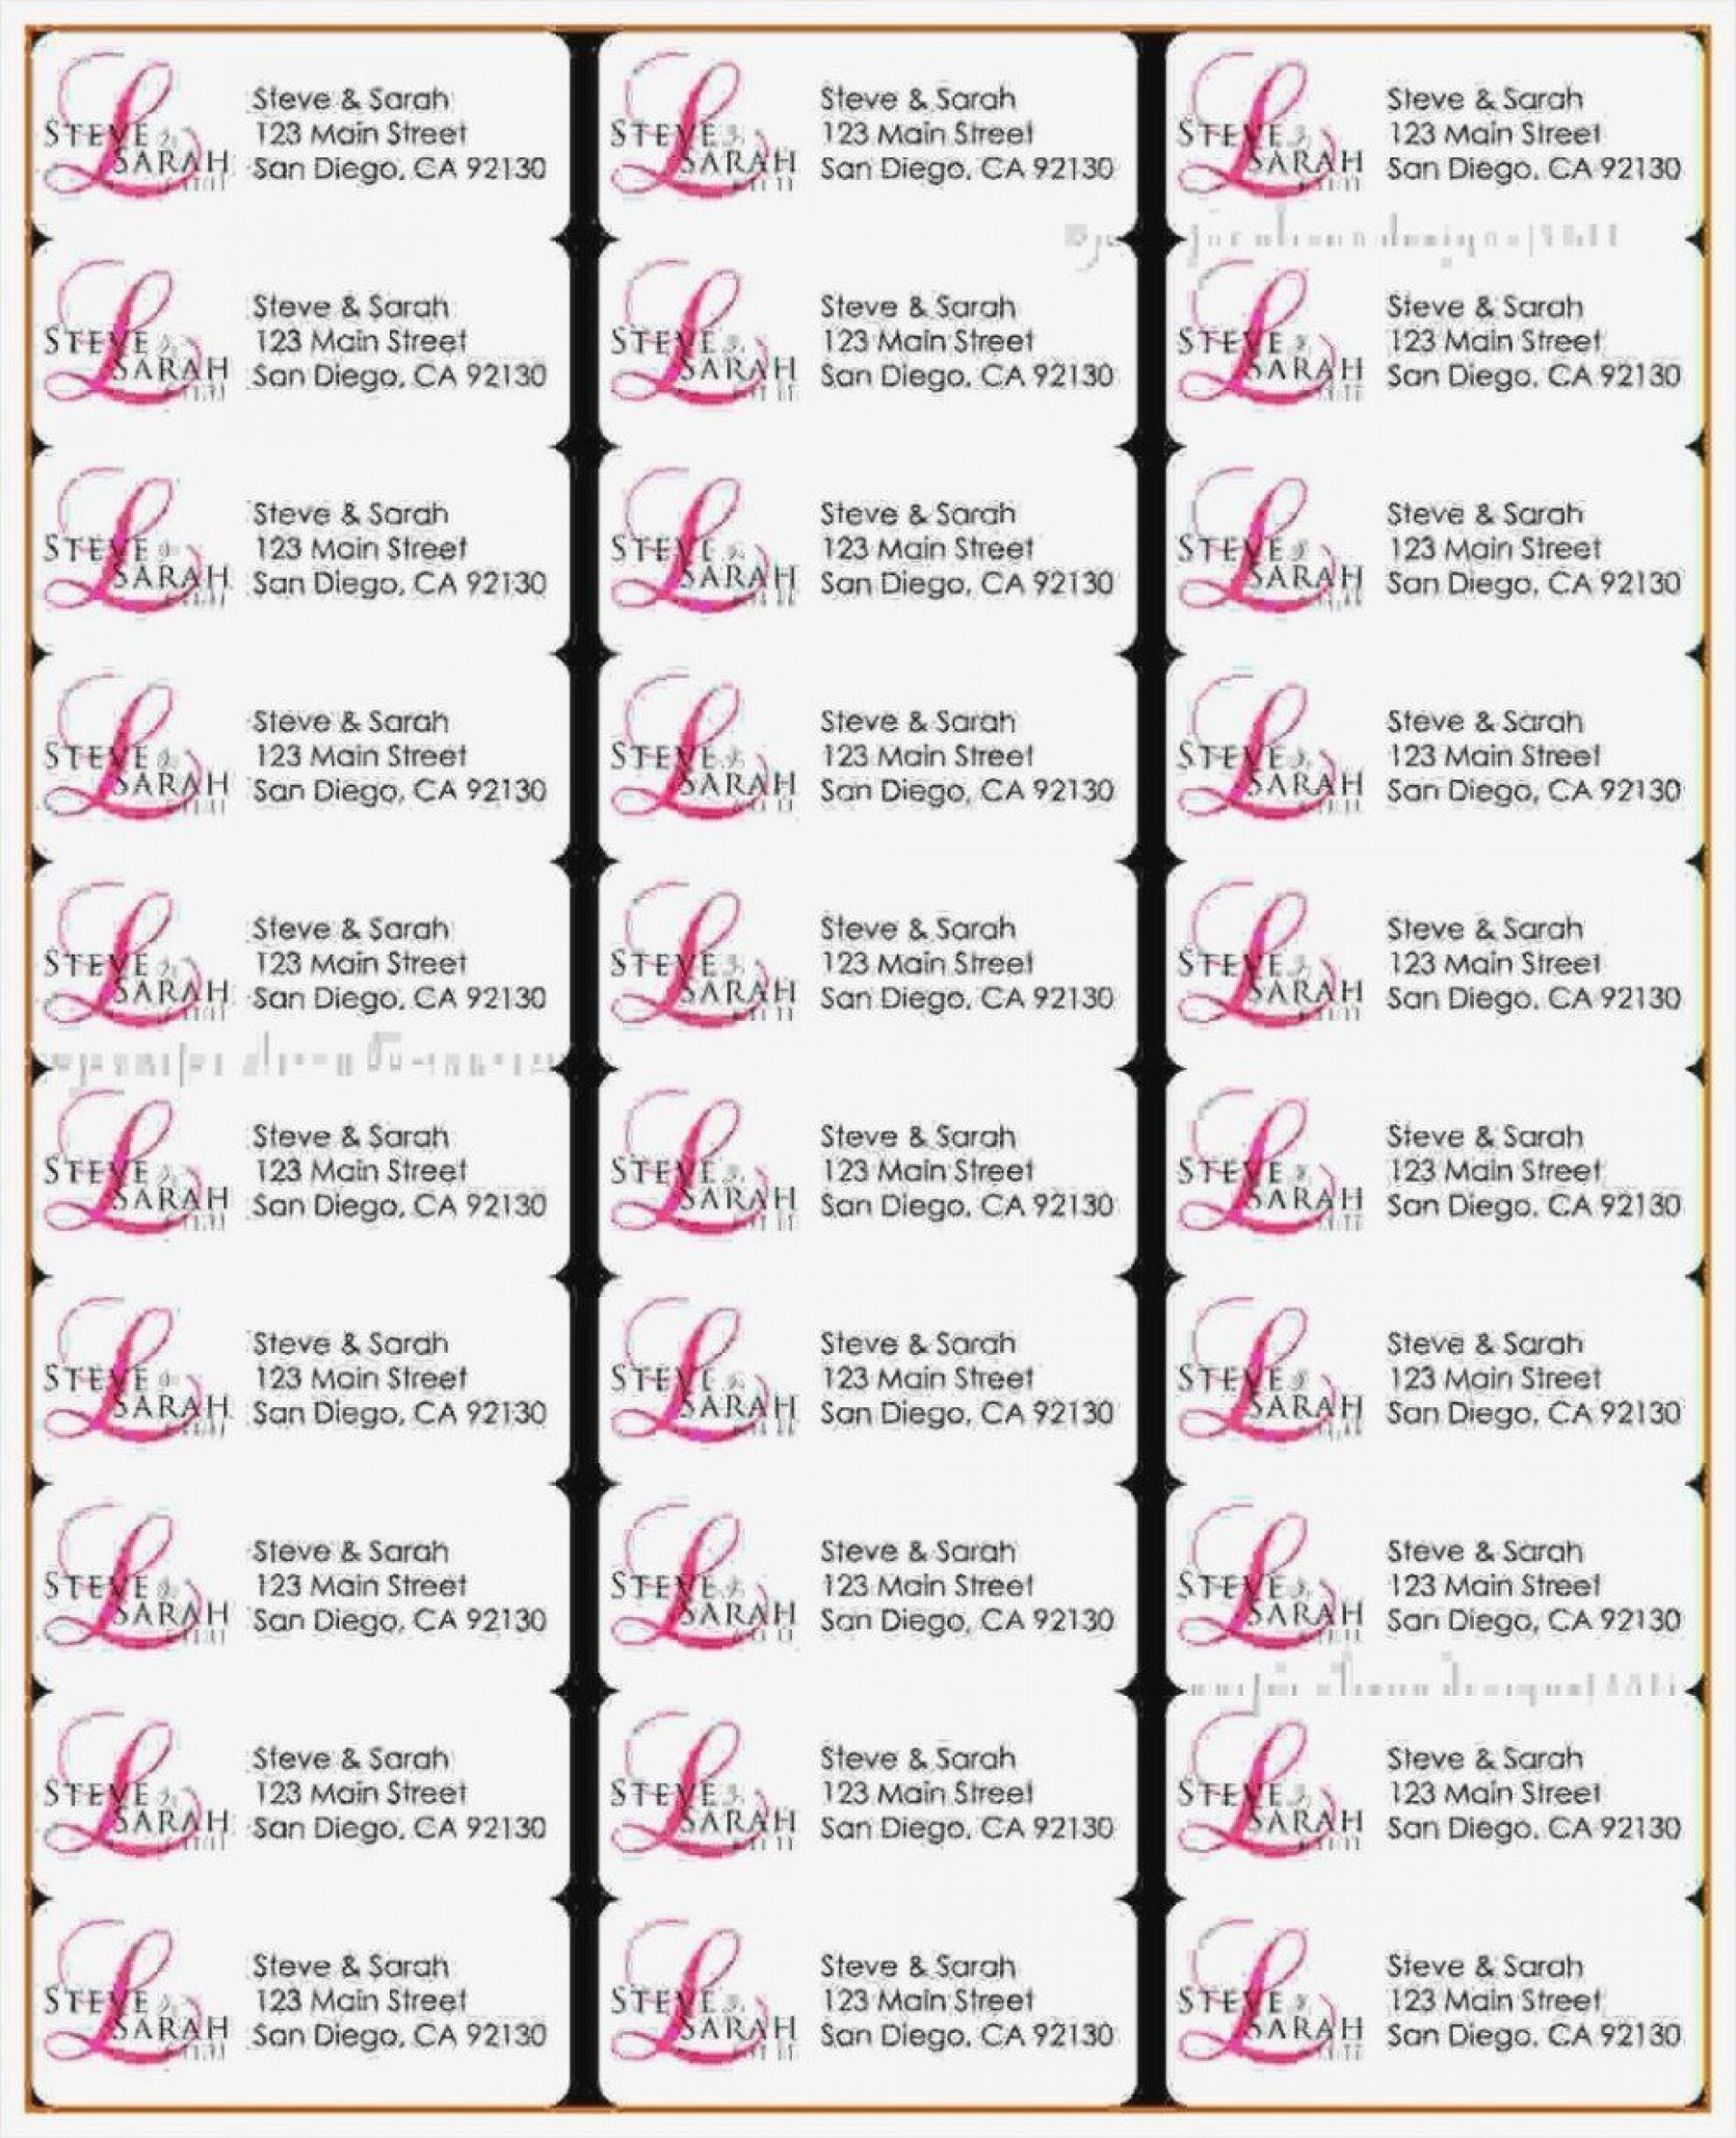 003 Wondrou Return Addres Label Template Sample  Google Doc Avery 80 Per Sheet Word Free1920